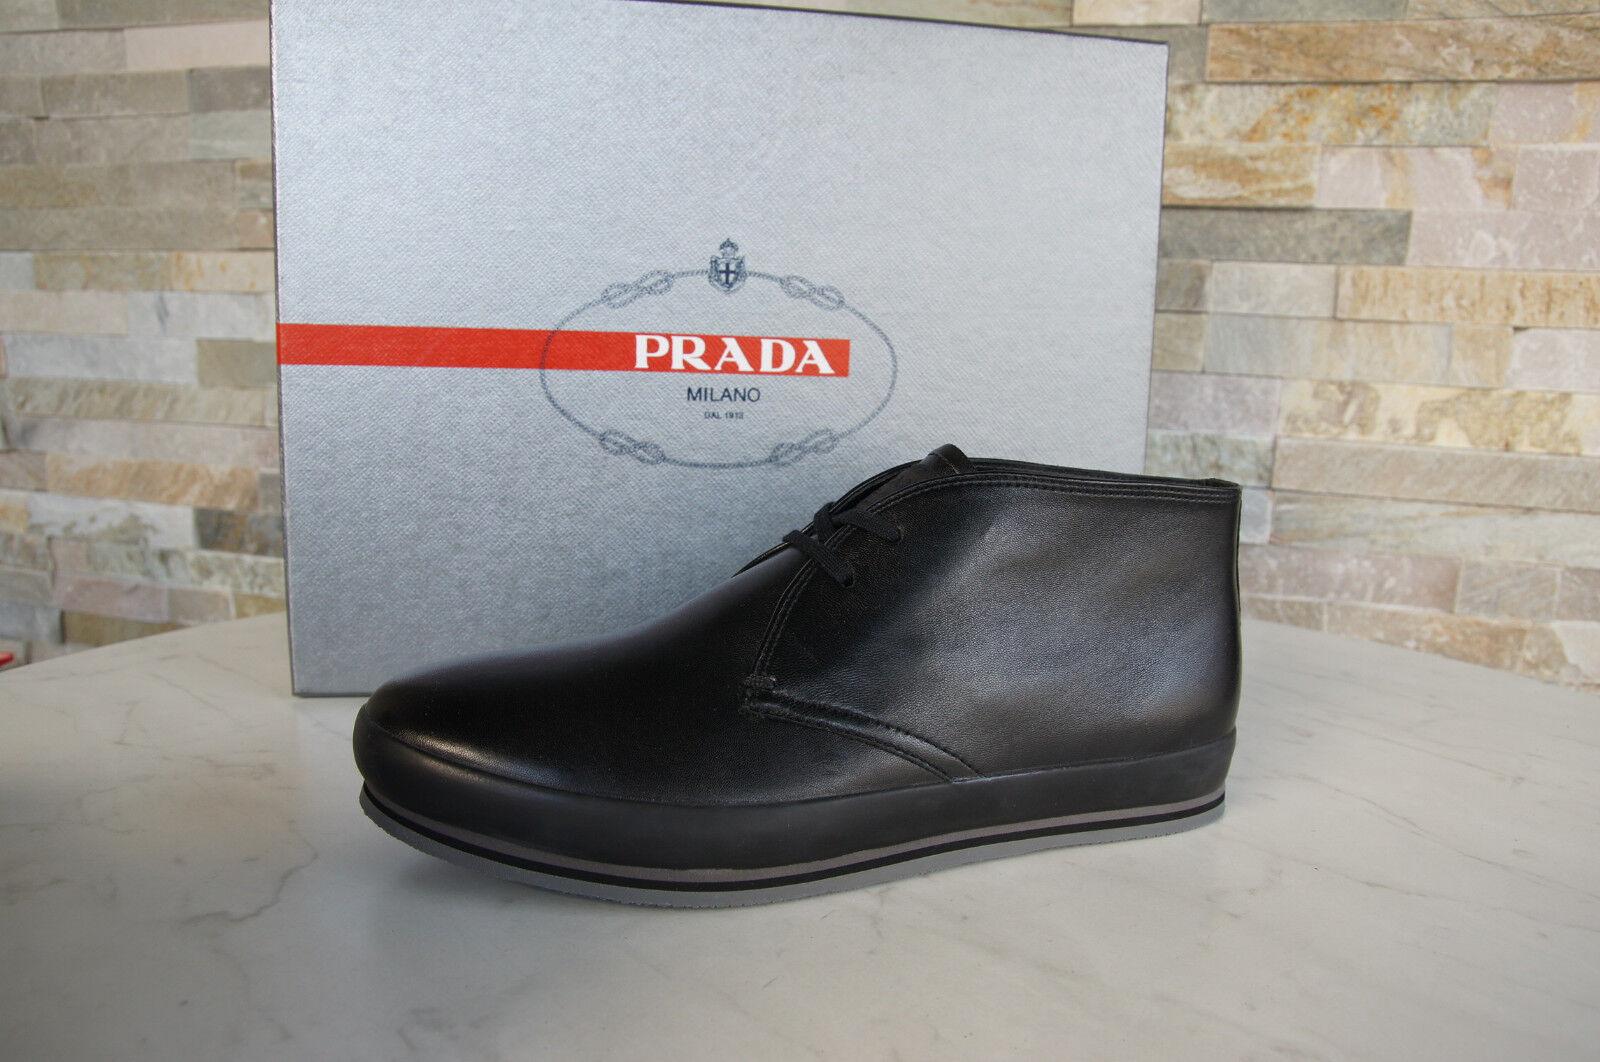 Prada Gr 6,5  40,5 Halbschuhe Schnürschuhe Schuhe 4T2405 schwarz  NEU  UVP 430